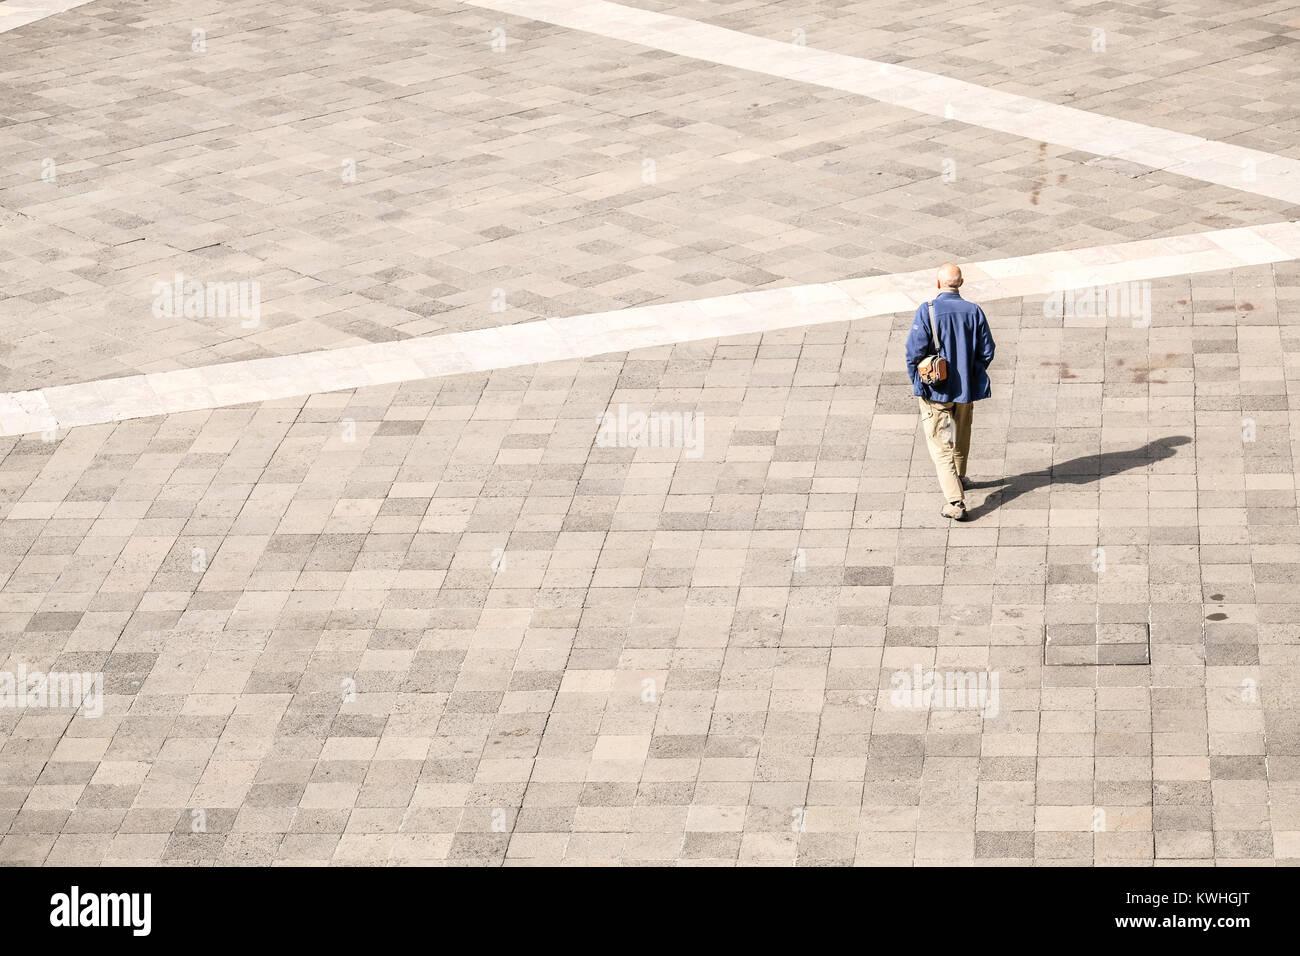 Ein einsamer Mann auf leerem Feld Stockbild